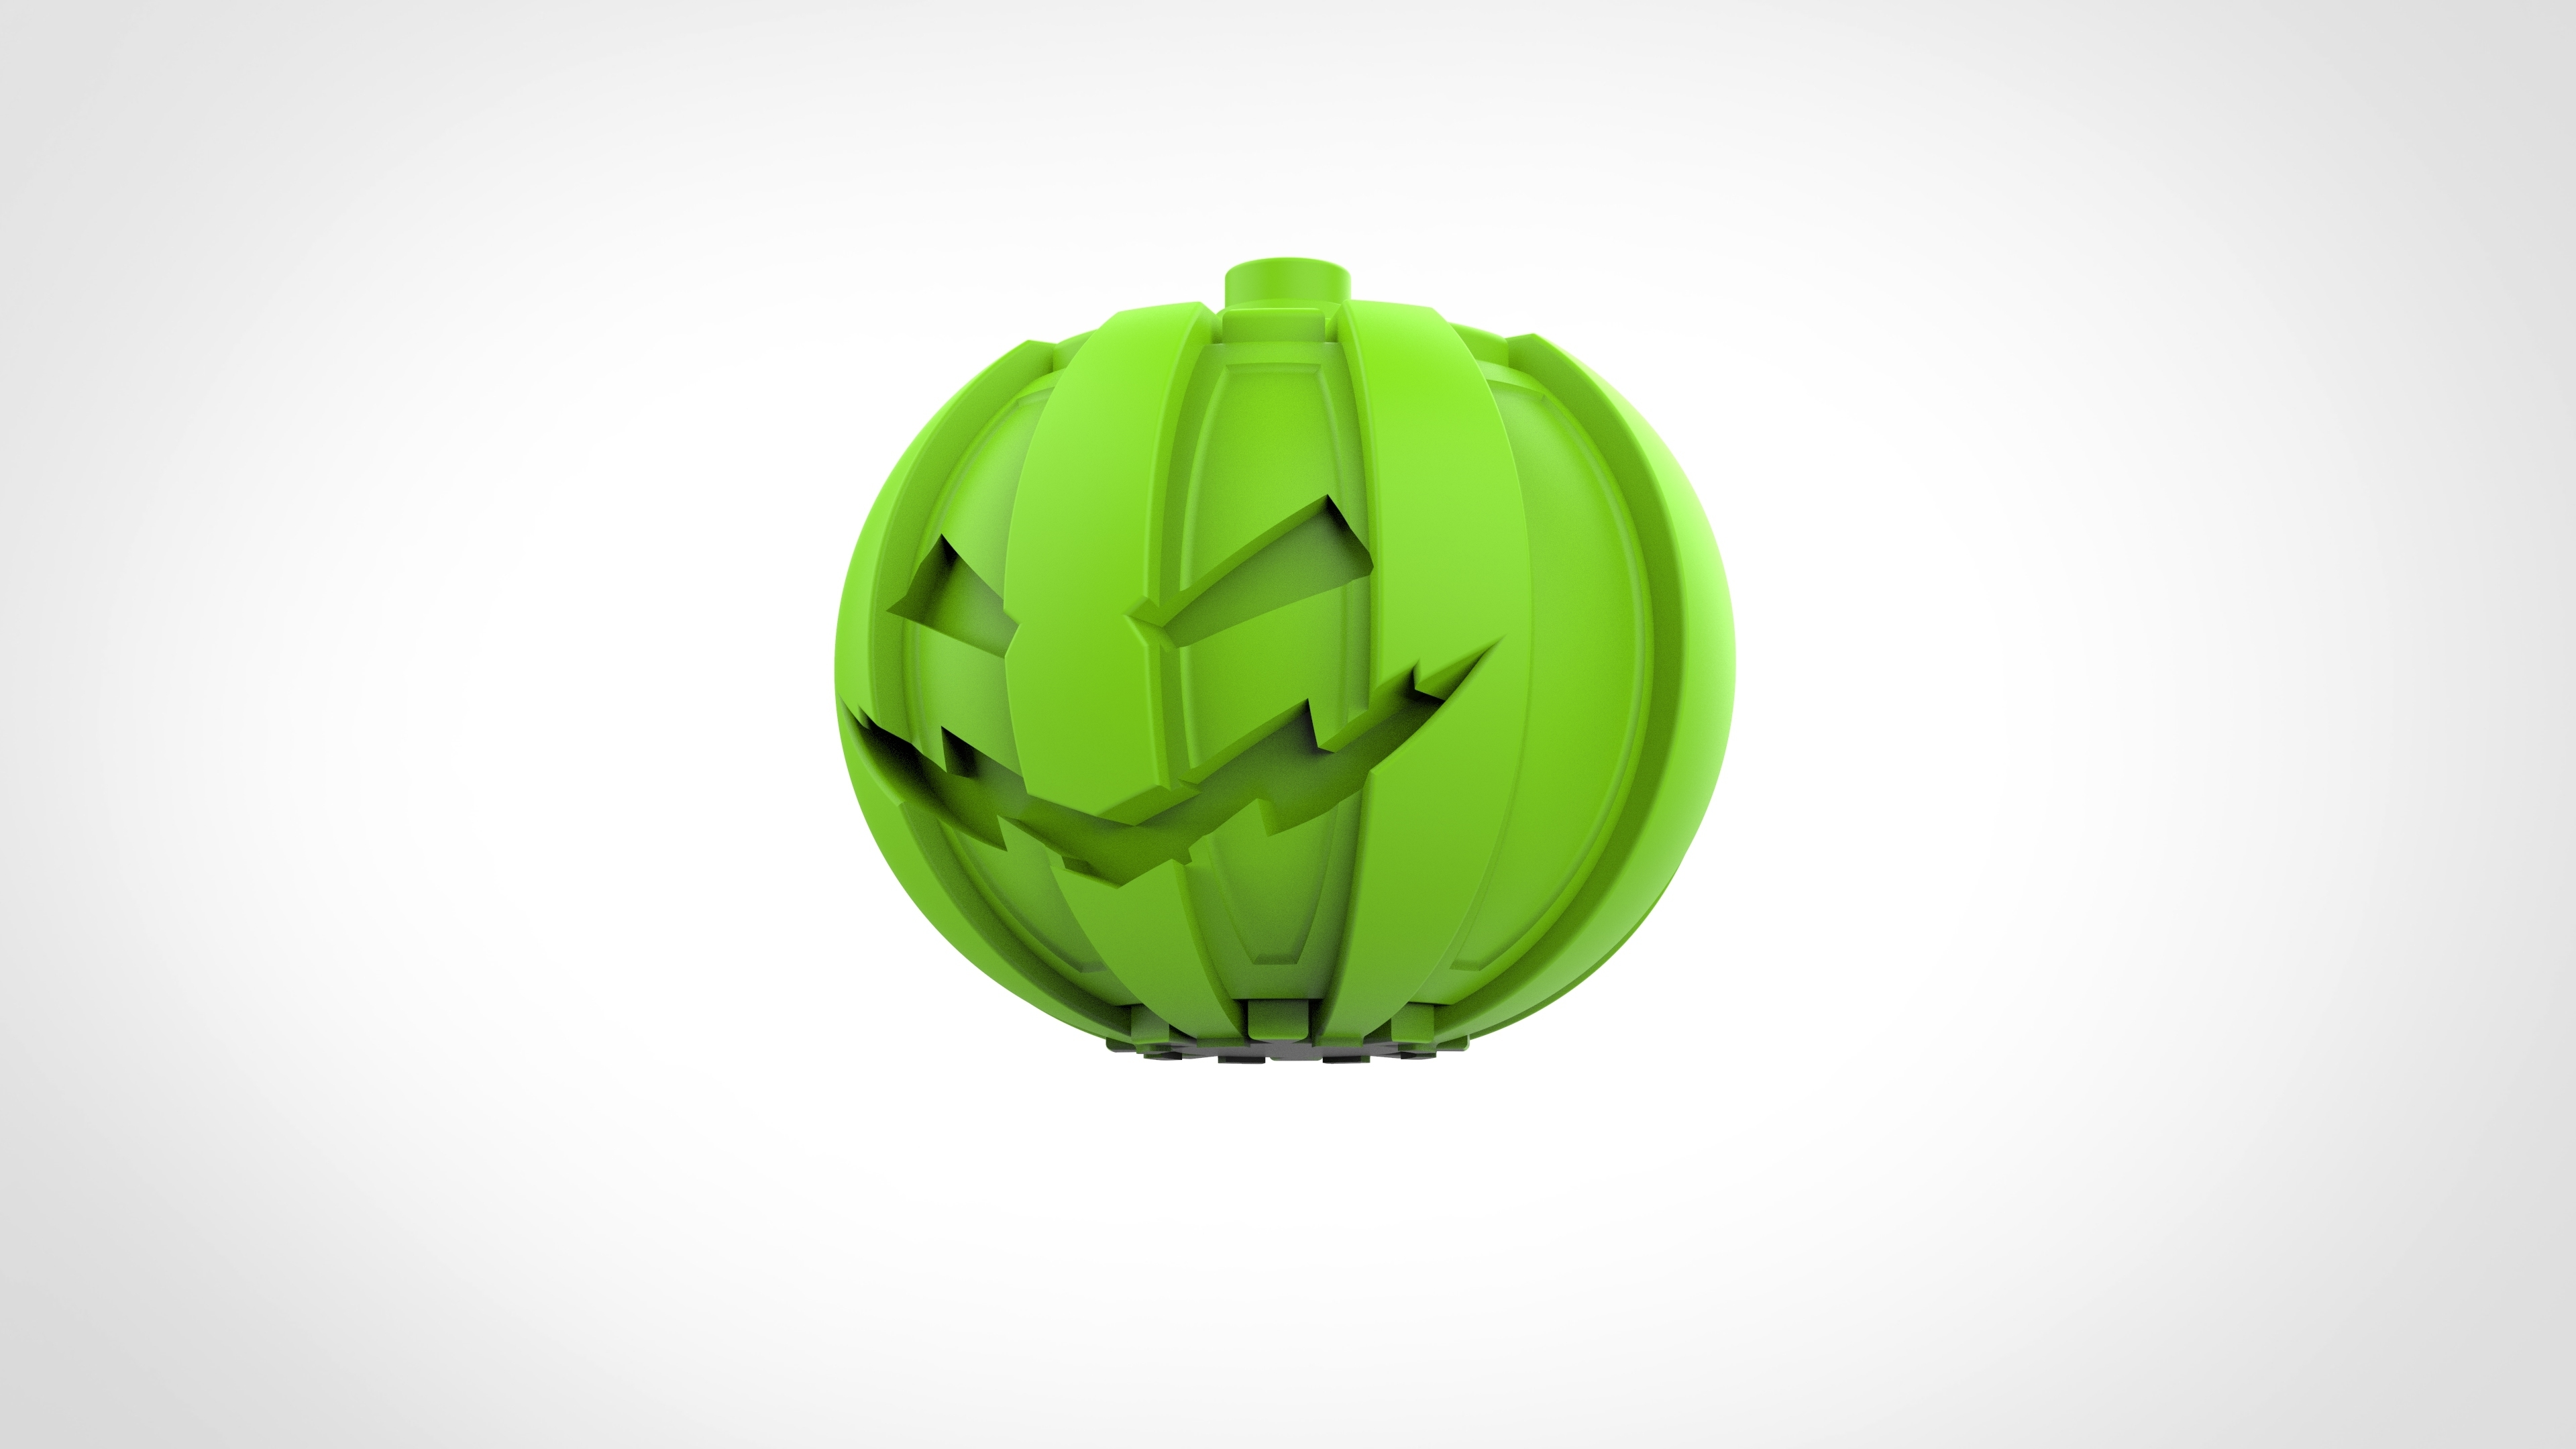 022.jpg Download 3MF file Green goblin bombs from the Spide-Man comics • 3D print model, vetrock